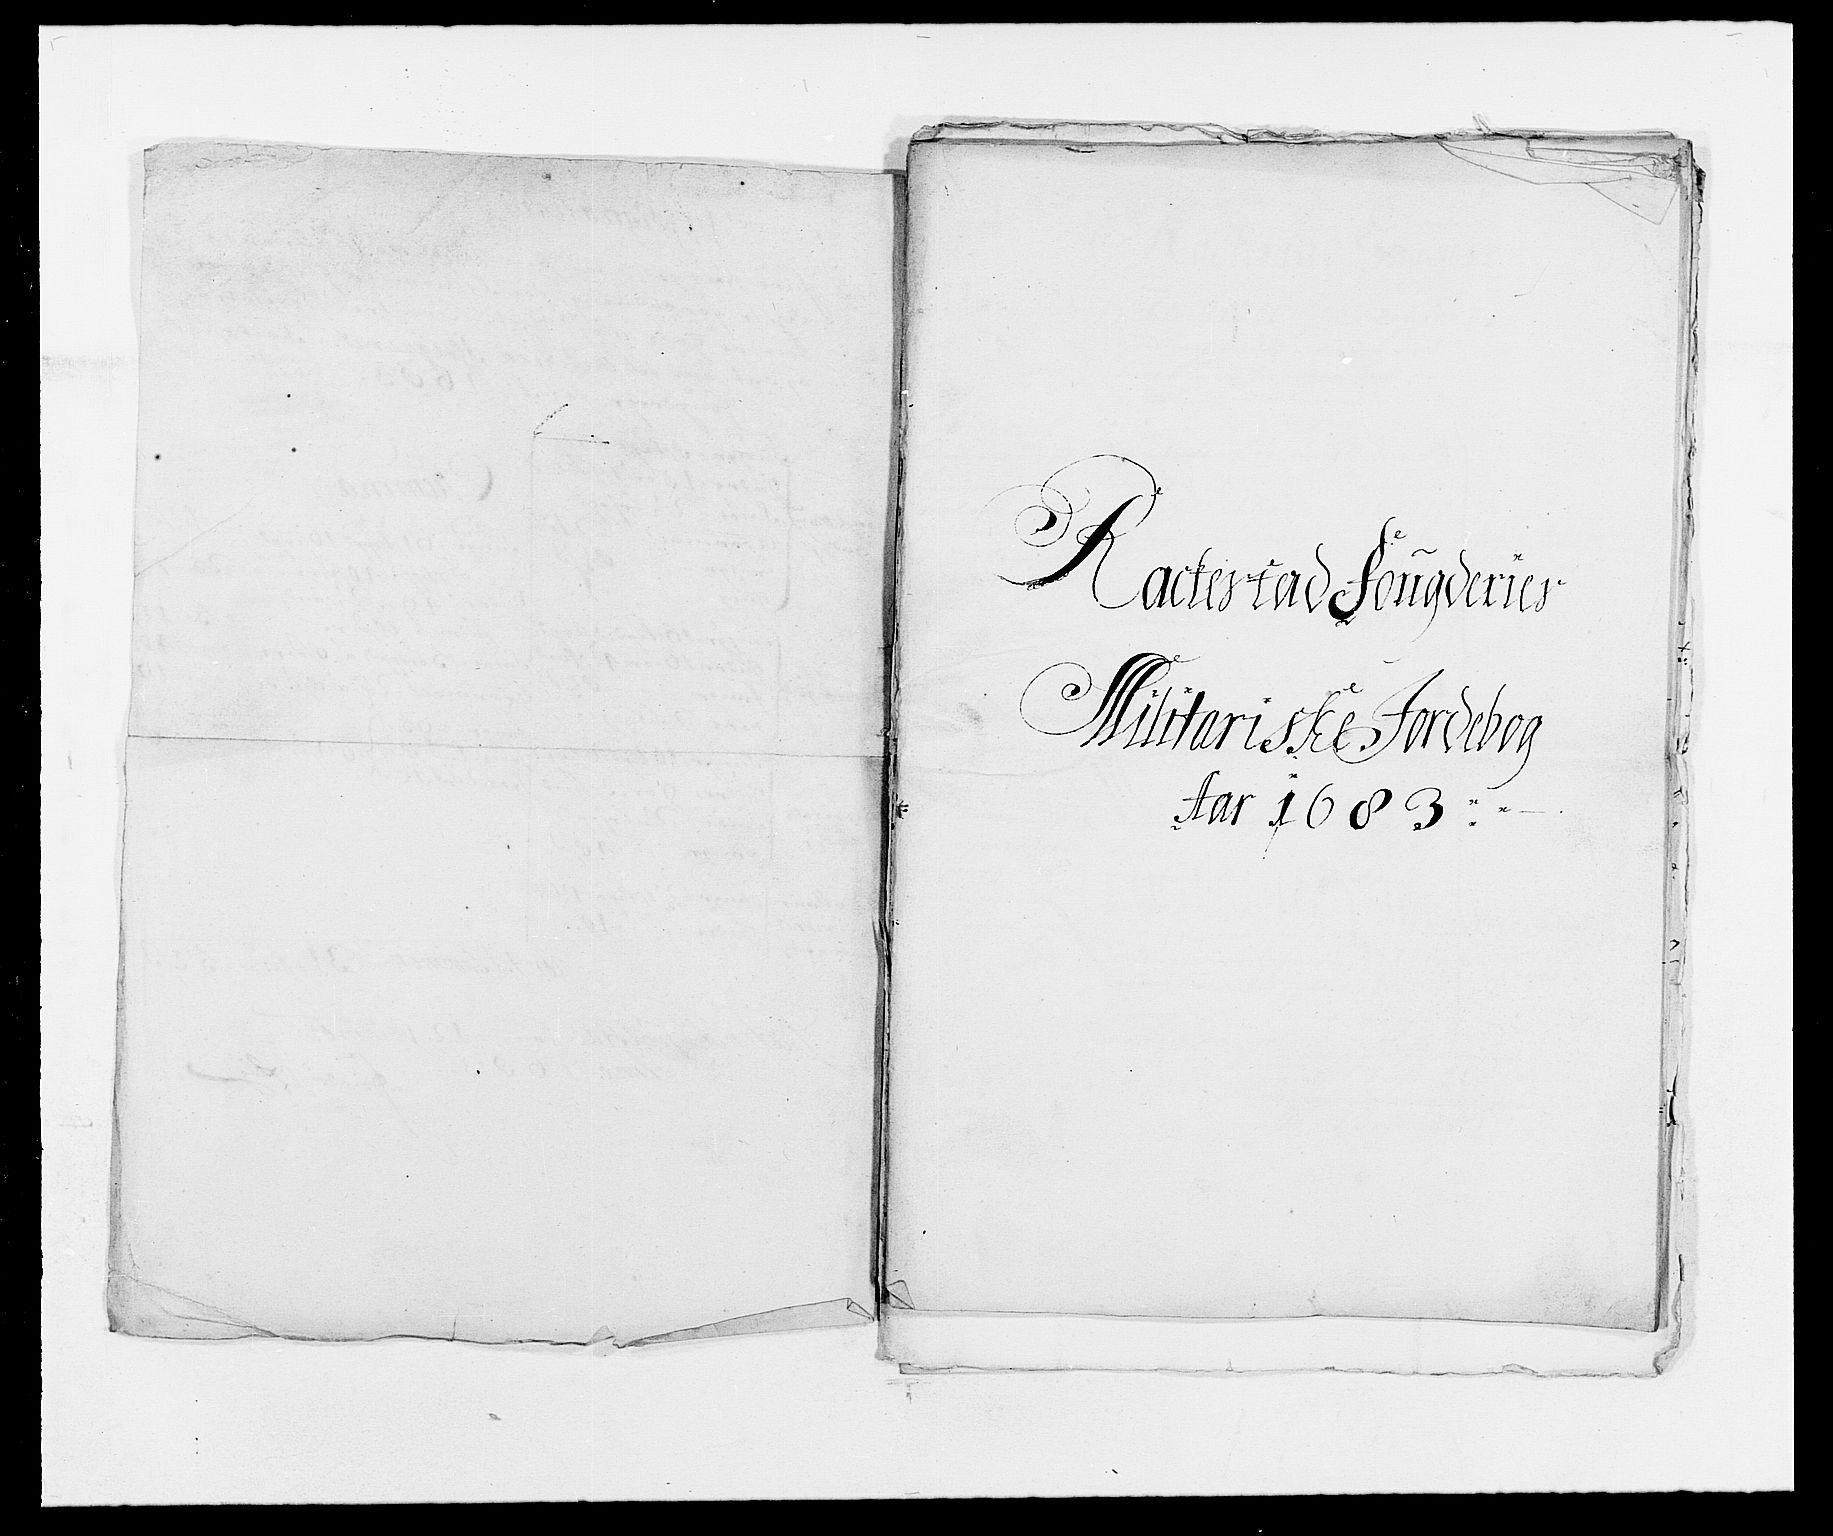 RA, Rentekammeret inntil 1814, Reviderte regnskaper, Fogderegnskap, R05/L0274: Fogderegnskap Rakkestad, 1683-1684, s. 211